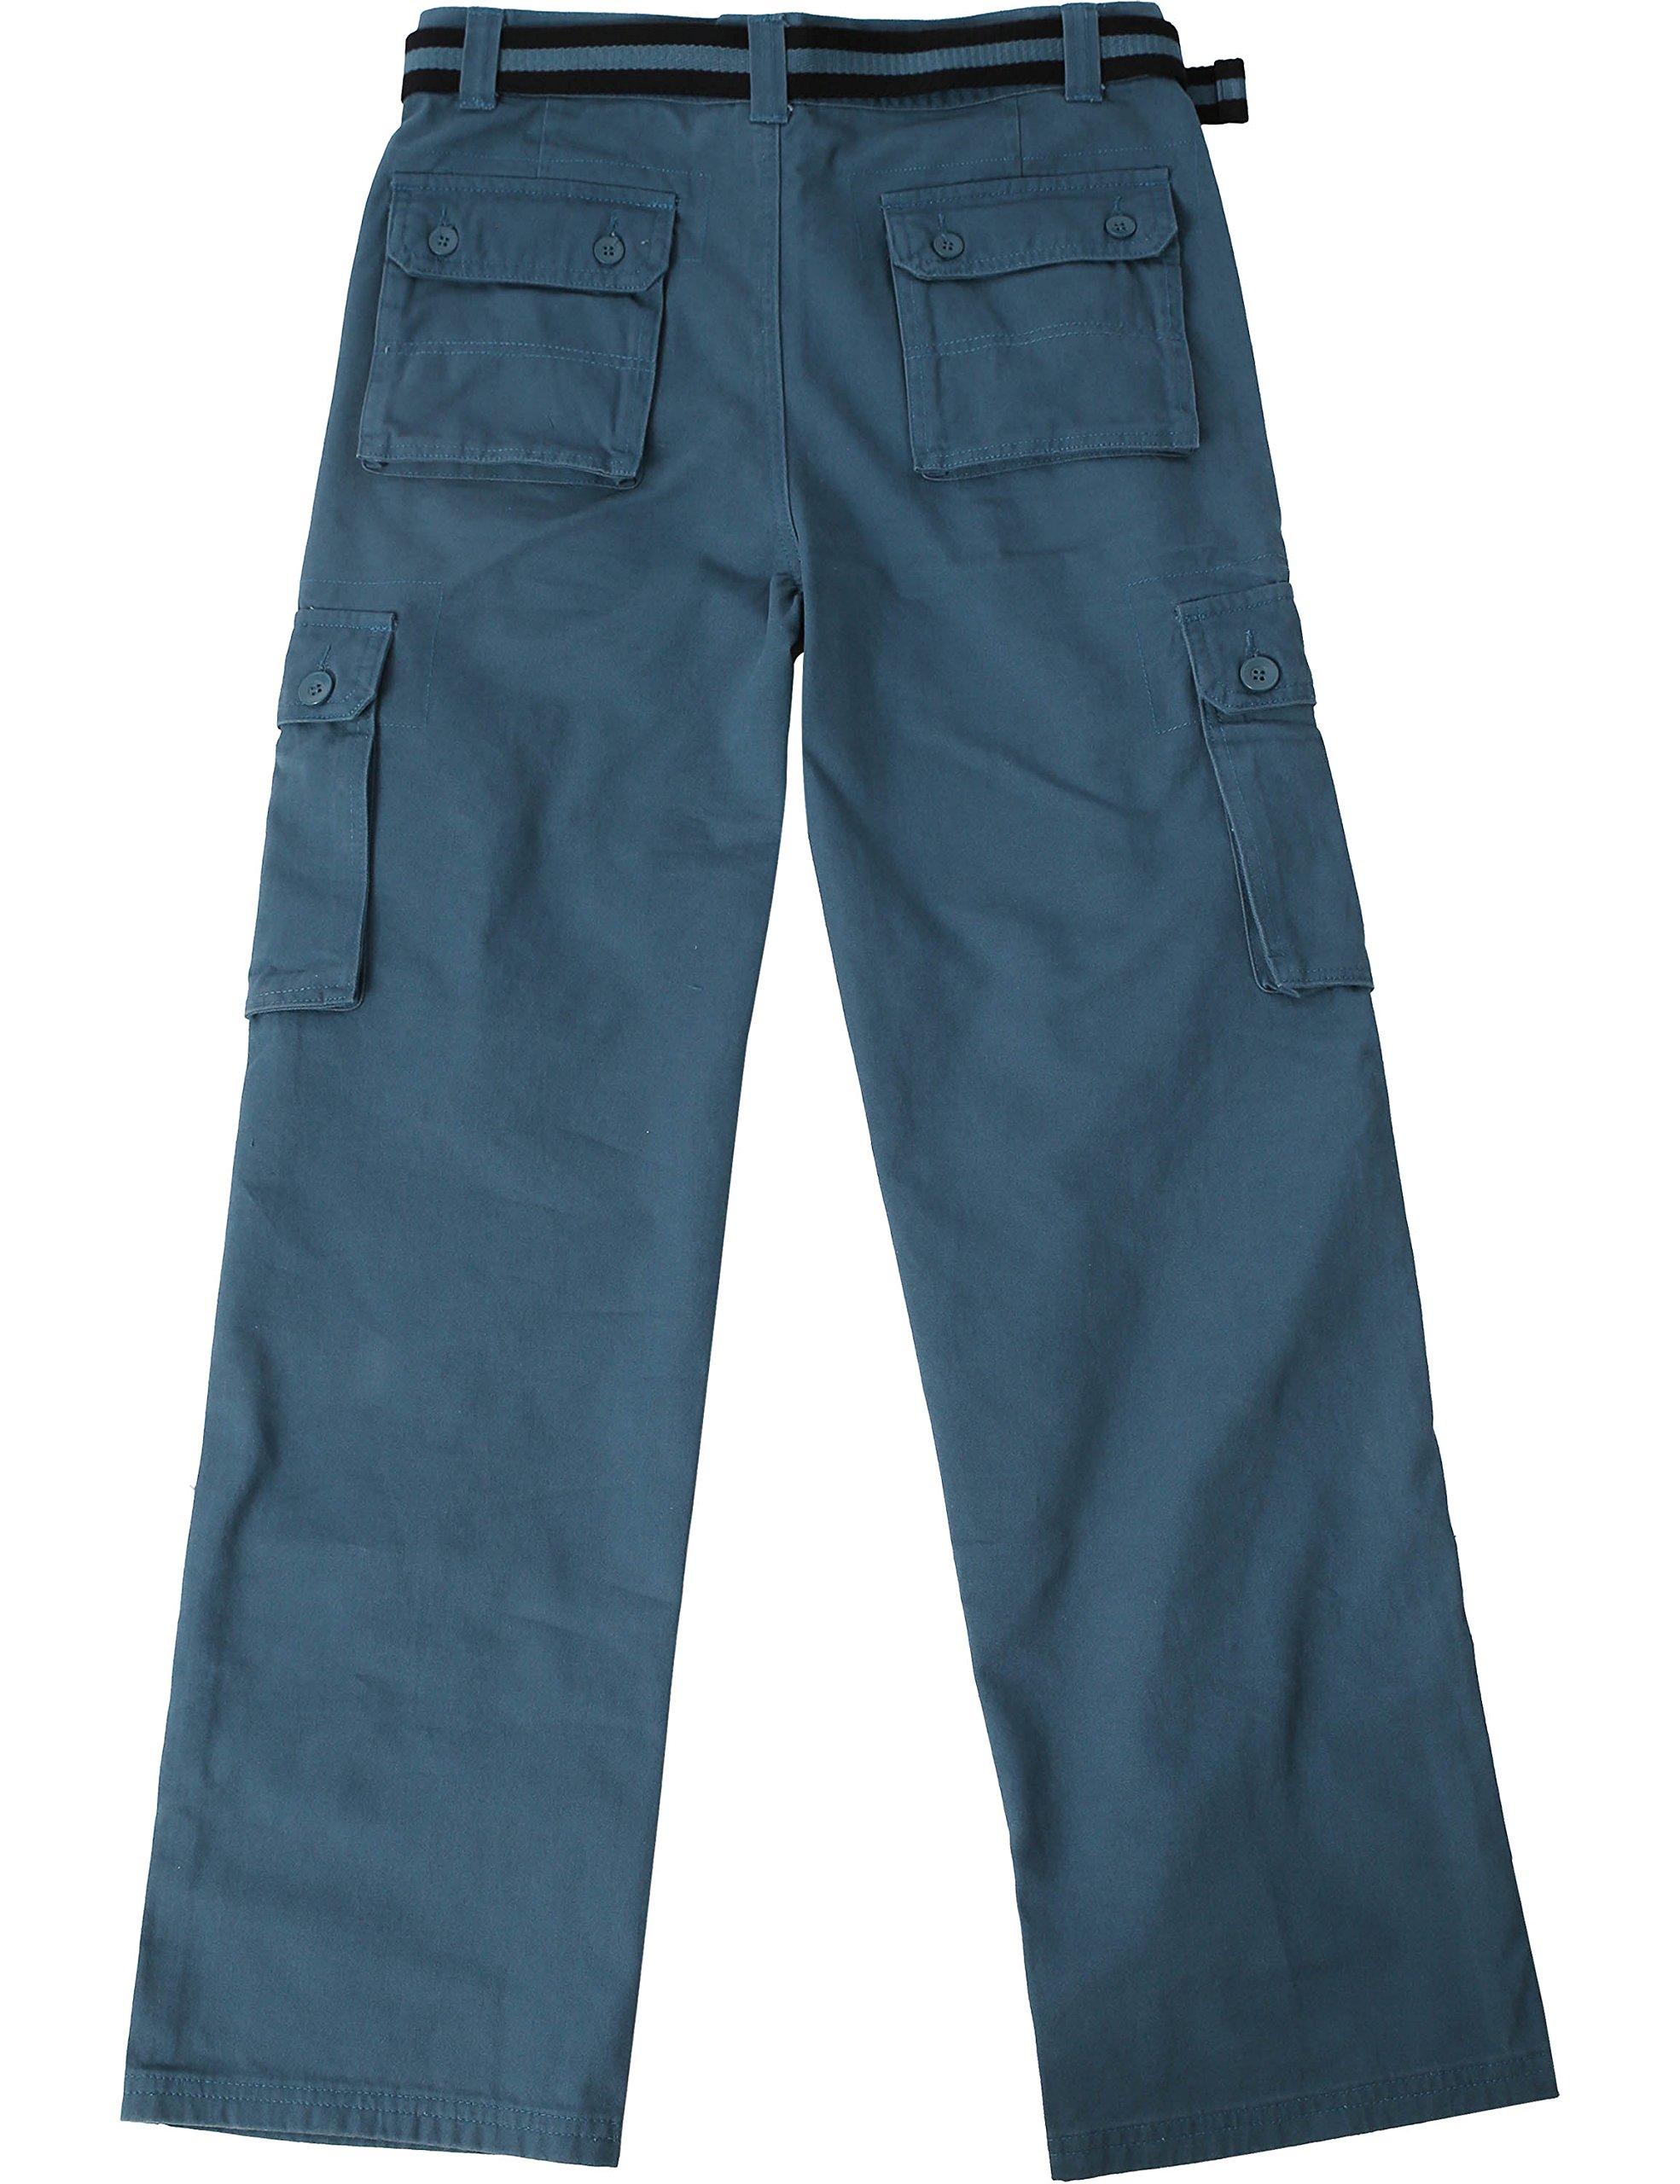 Ma Croix JP Mens Cargo Pants with Utility Belt (40/ pj01_dkblue) by Ma Croix (Image #2)